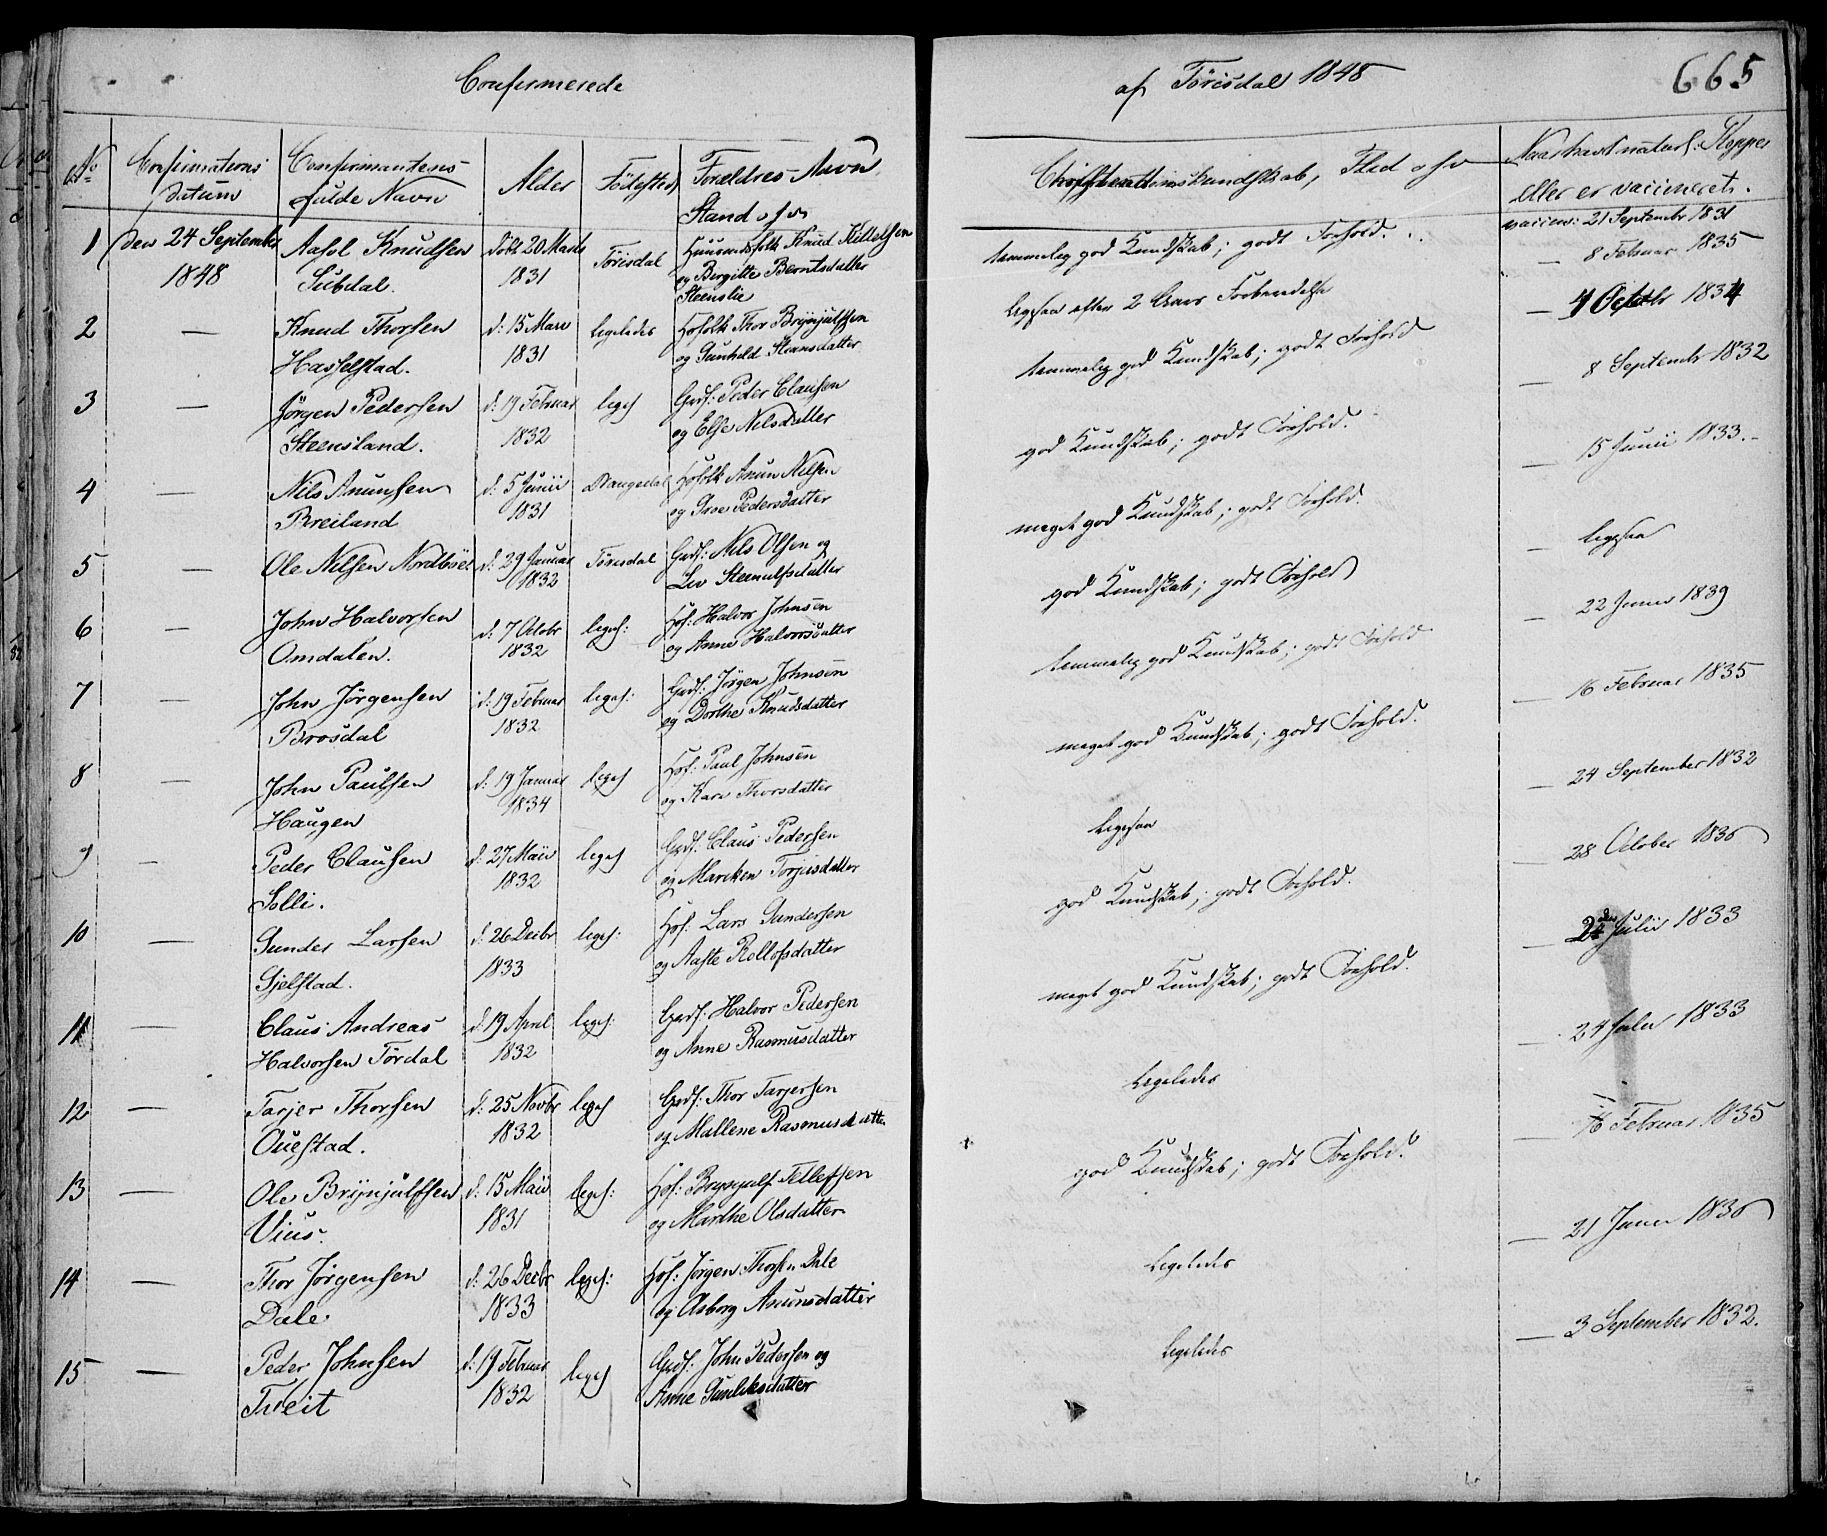 SAKO, Drangedal kirkebøker, F/Fa/L0007b: Ministerialbok nr. 7b, 1837-1856, s. 665